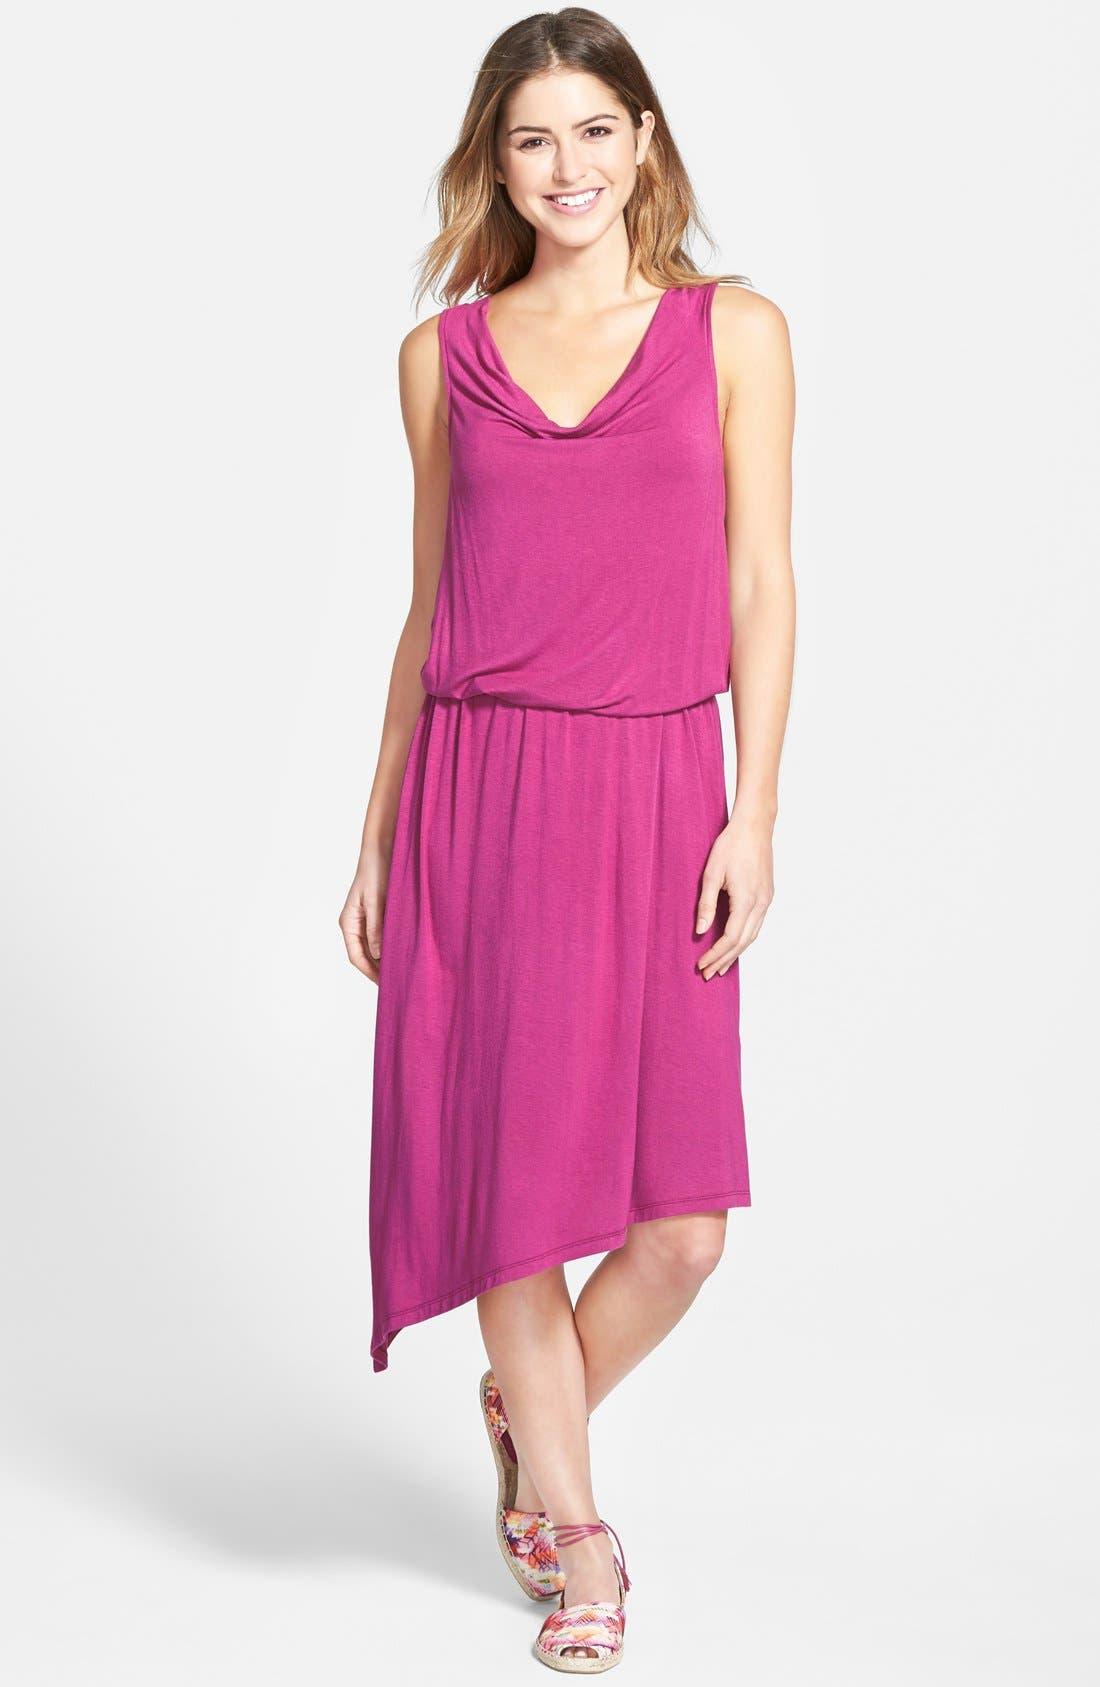 Alternate Image 1 Selected - Halogen® Blouson Dress with Asymmetrical Hem (Regular & Petite)